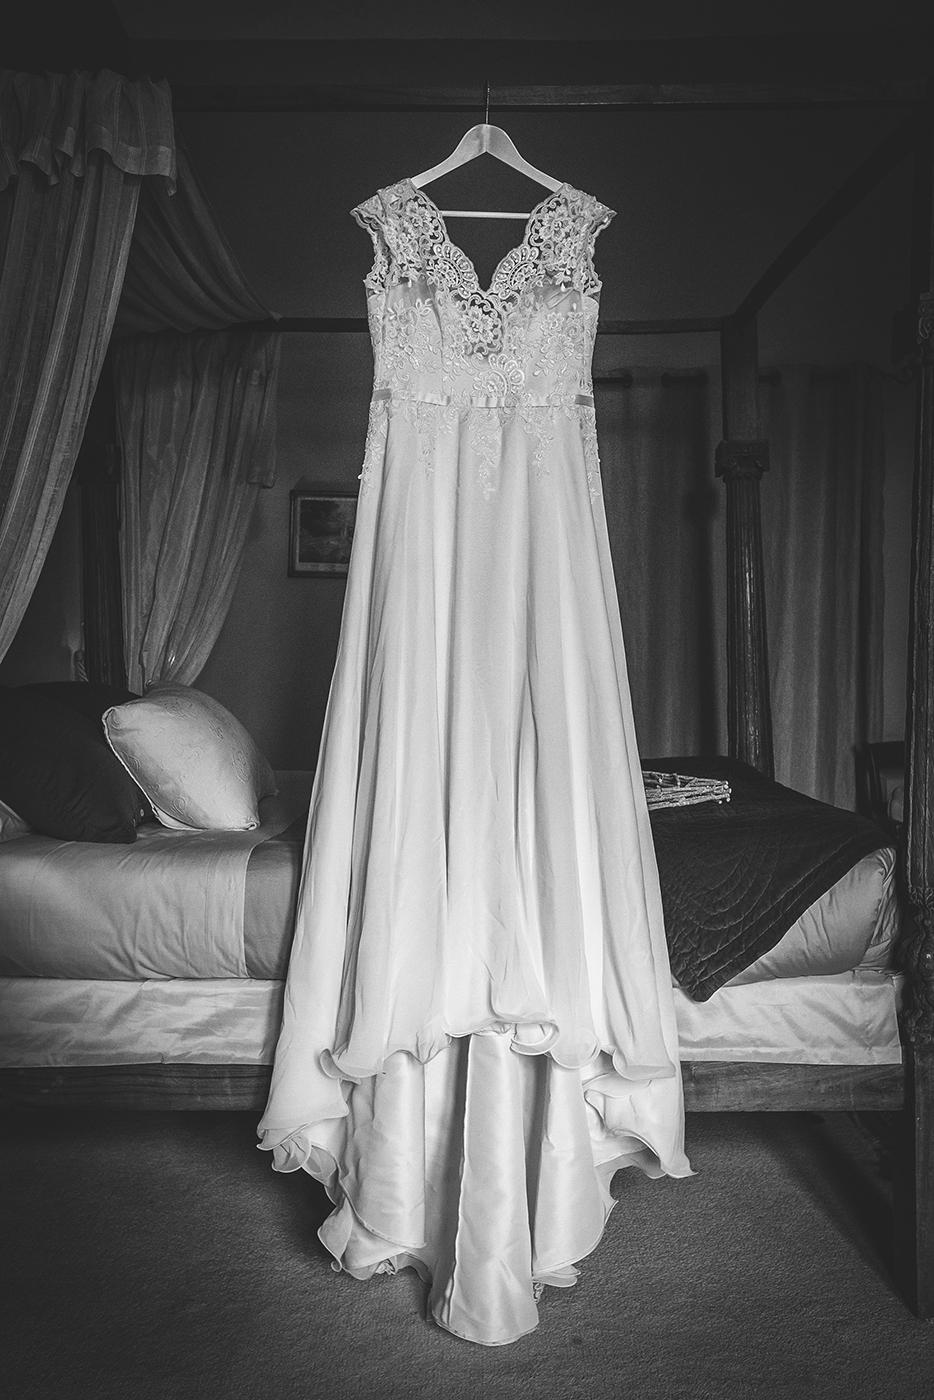 Photographe-mariage-preparatif-guillaume-heraud-01cp